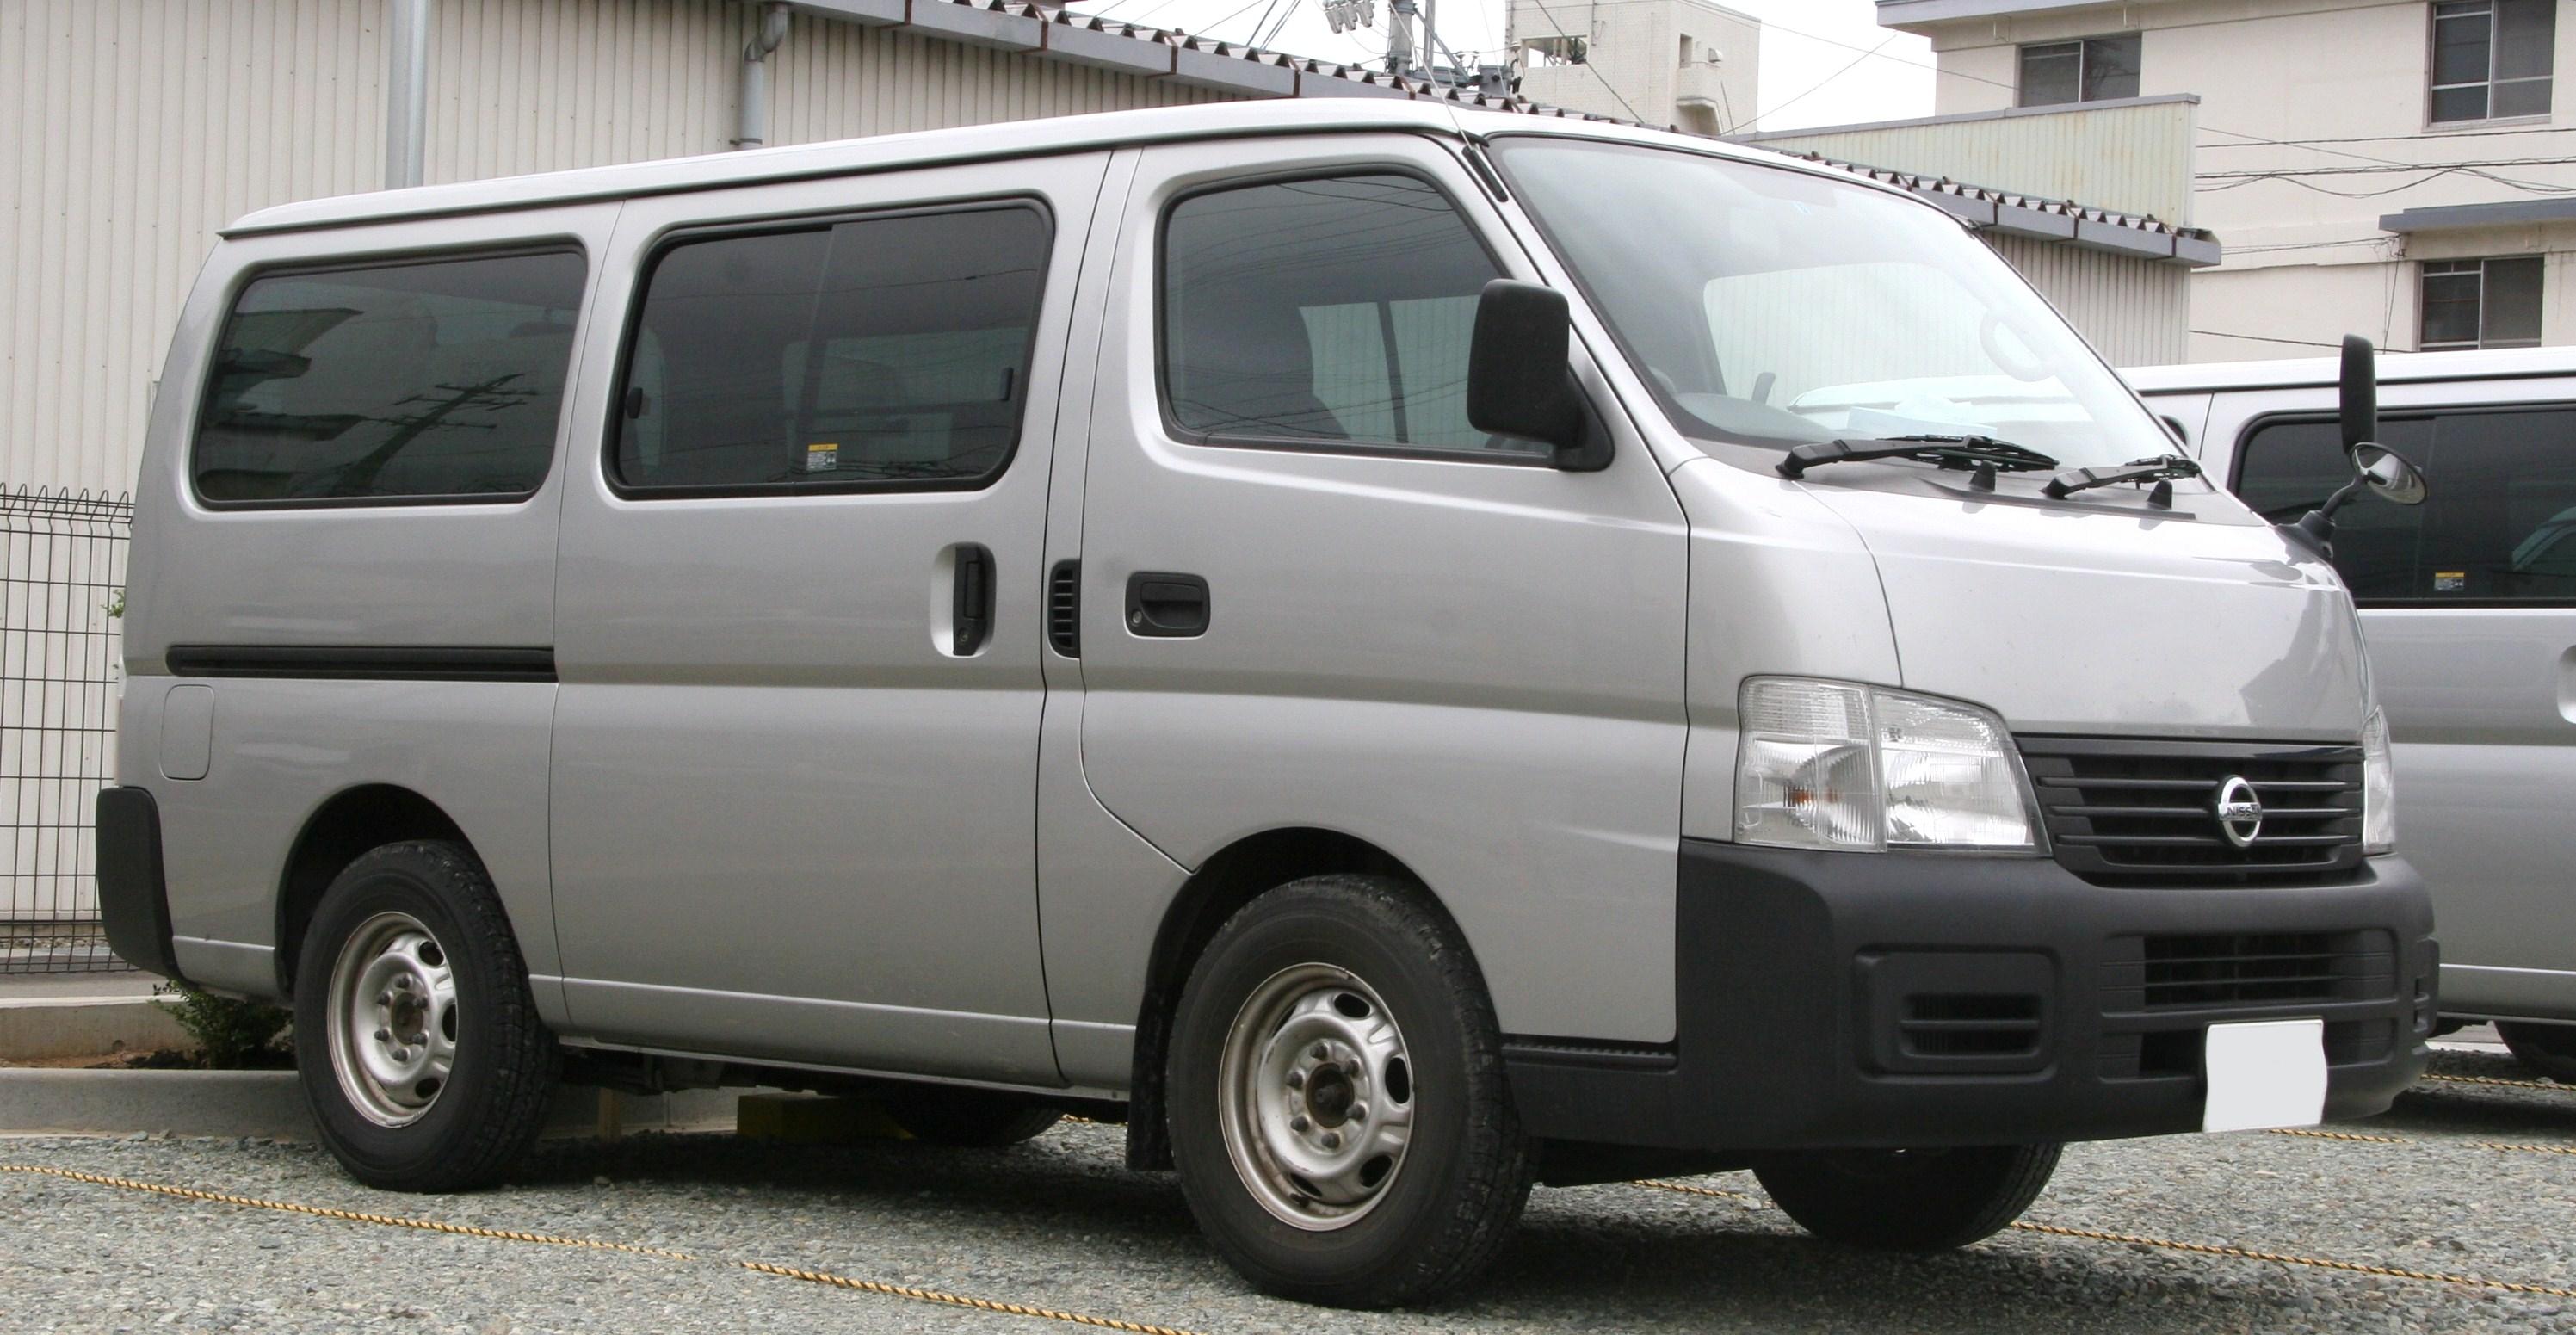 Nissan Caravan II (E23) 1980 - 1986 Minivan #4